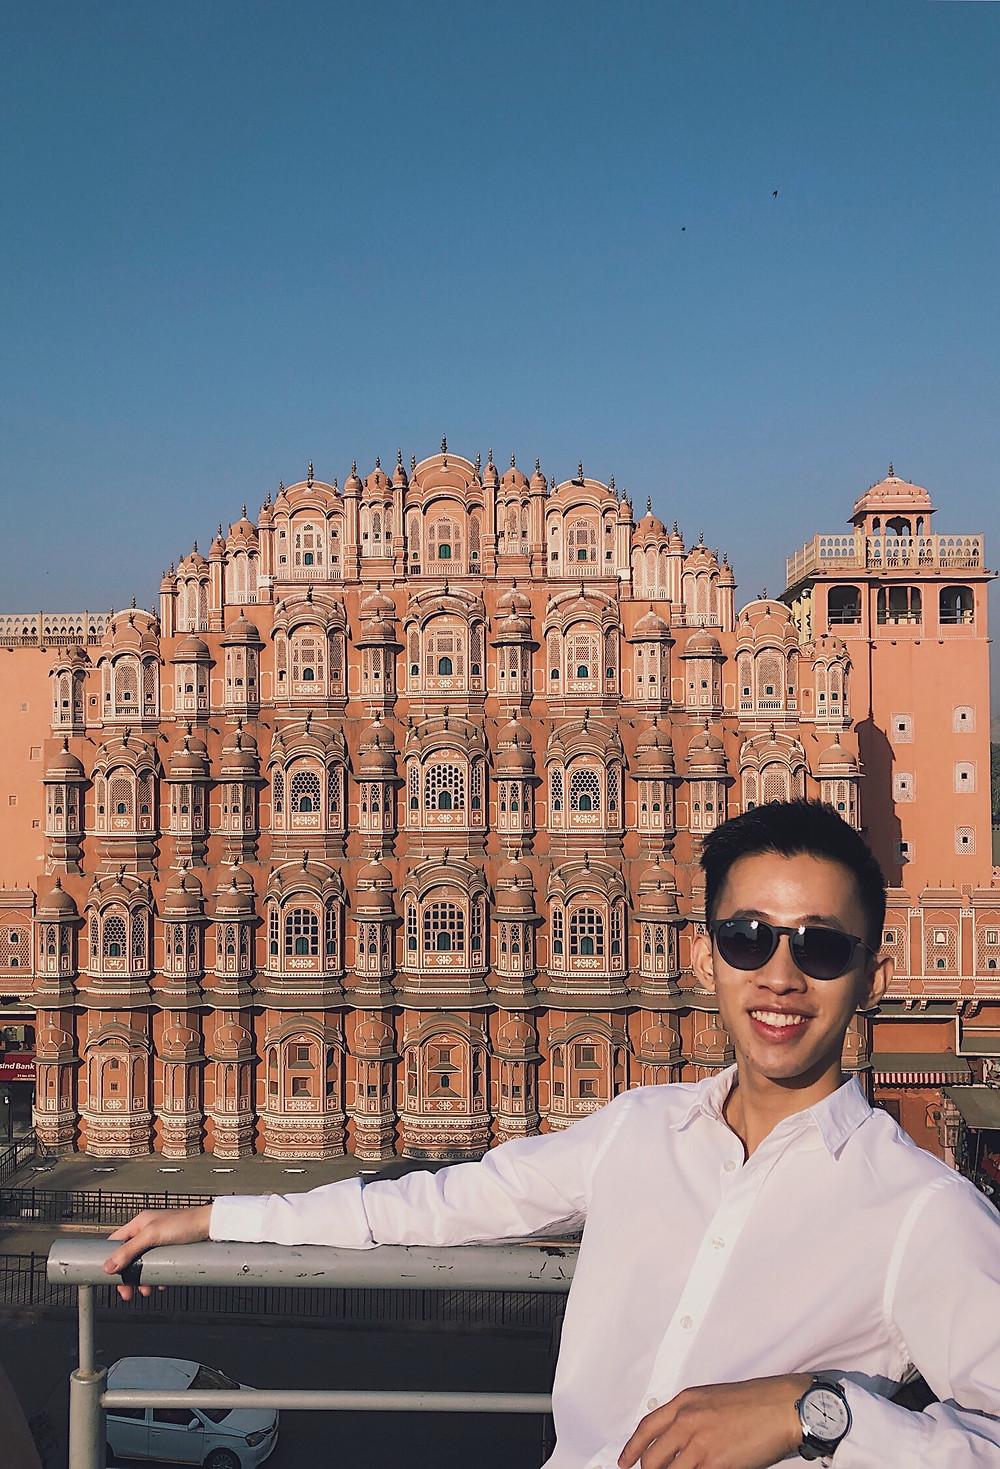 The view of Hawa Mahal in Jaipur, Rajasthan, India